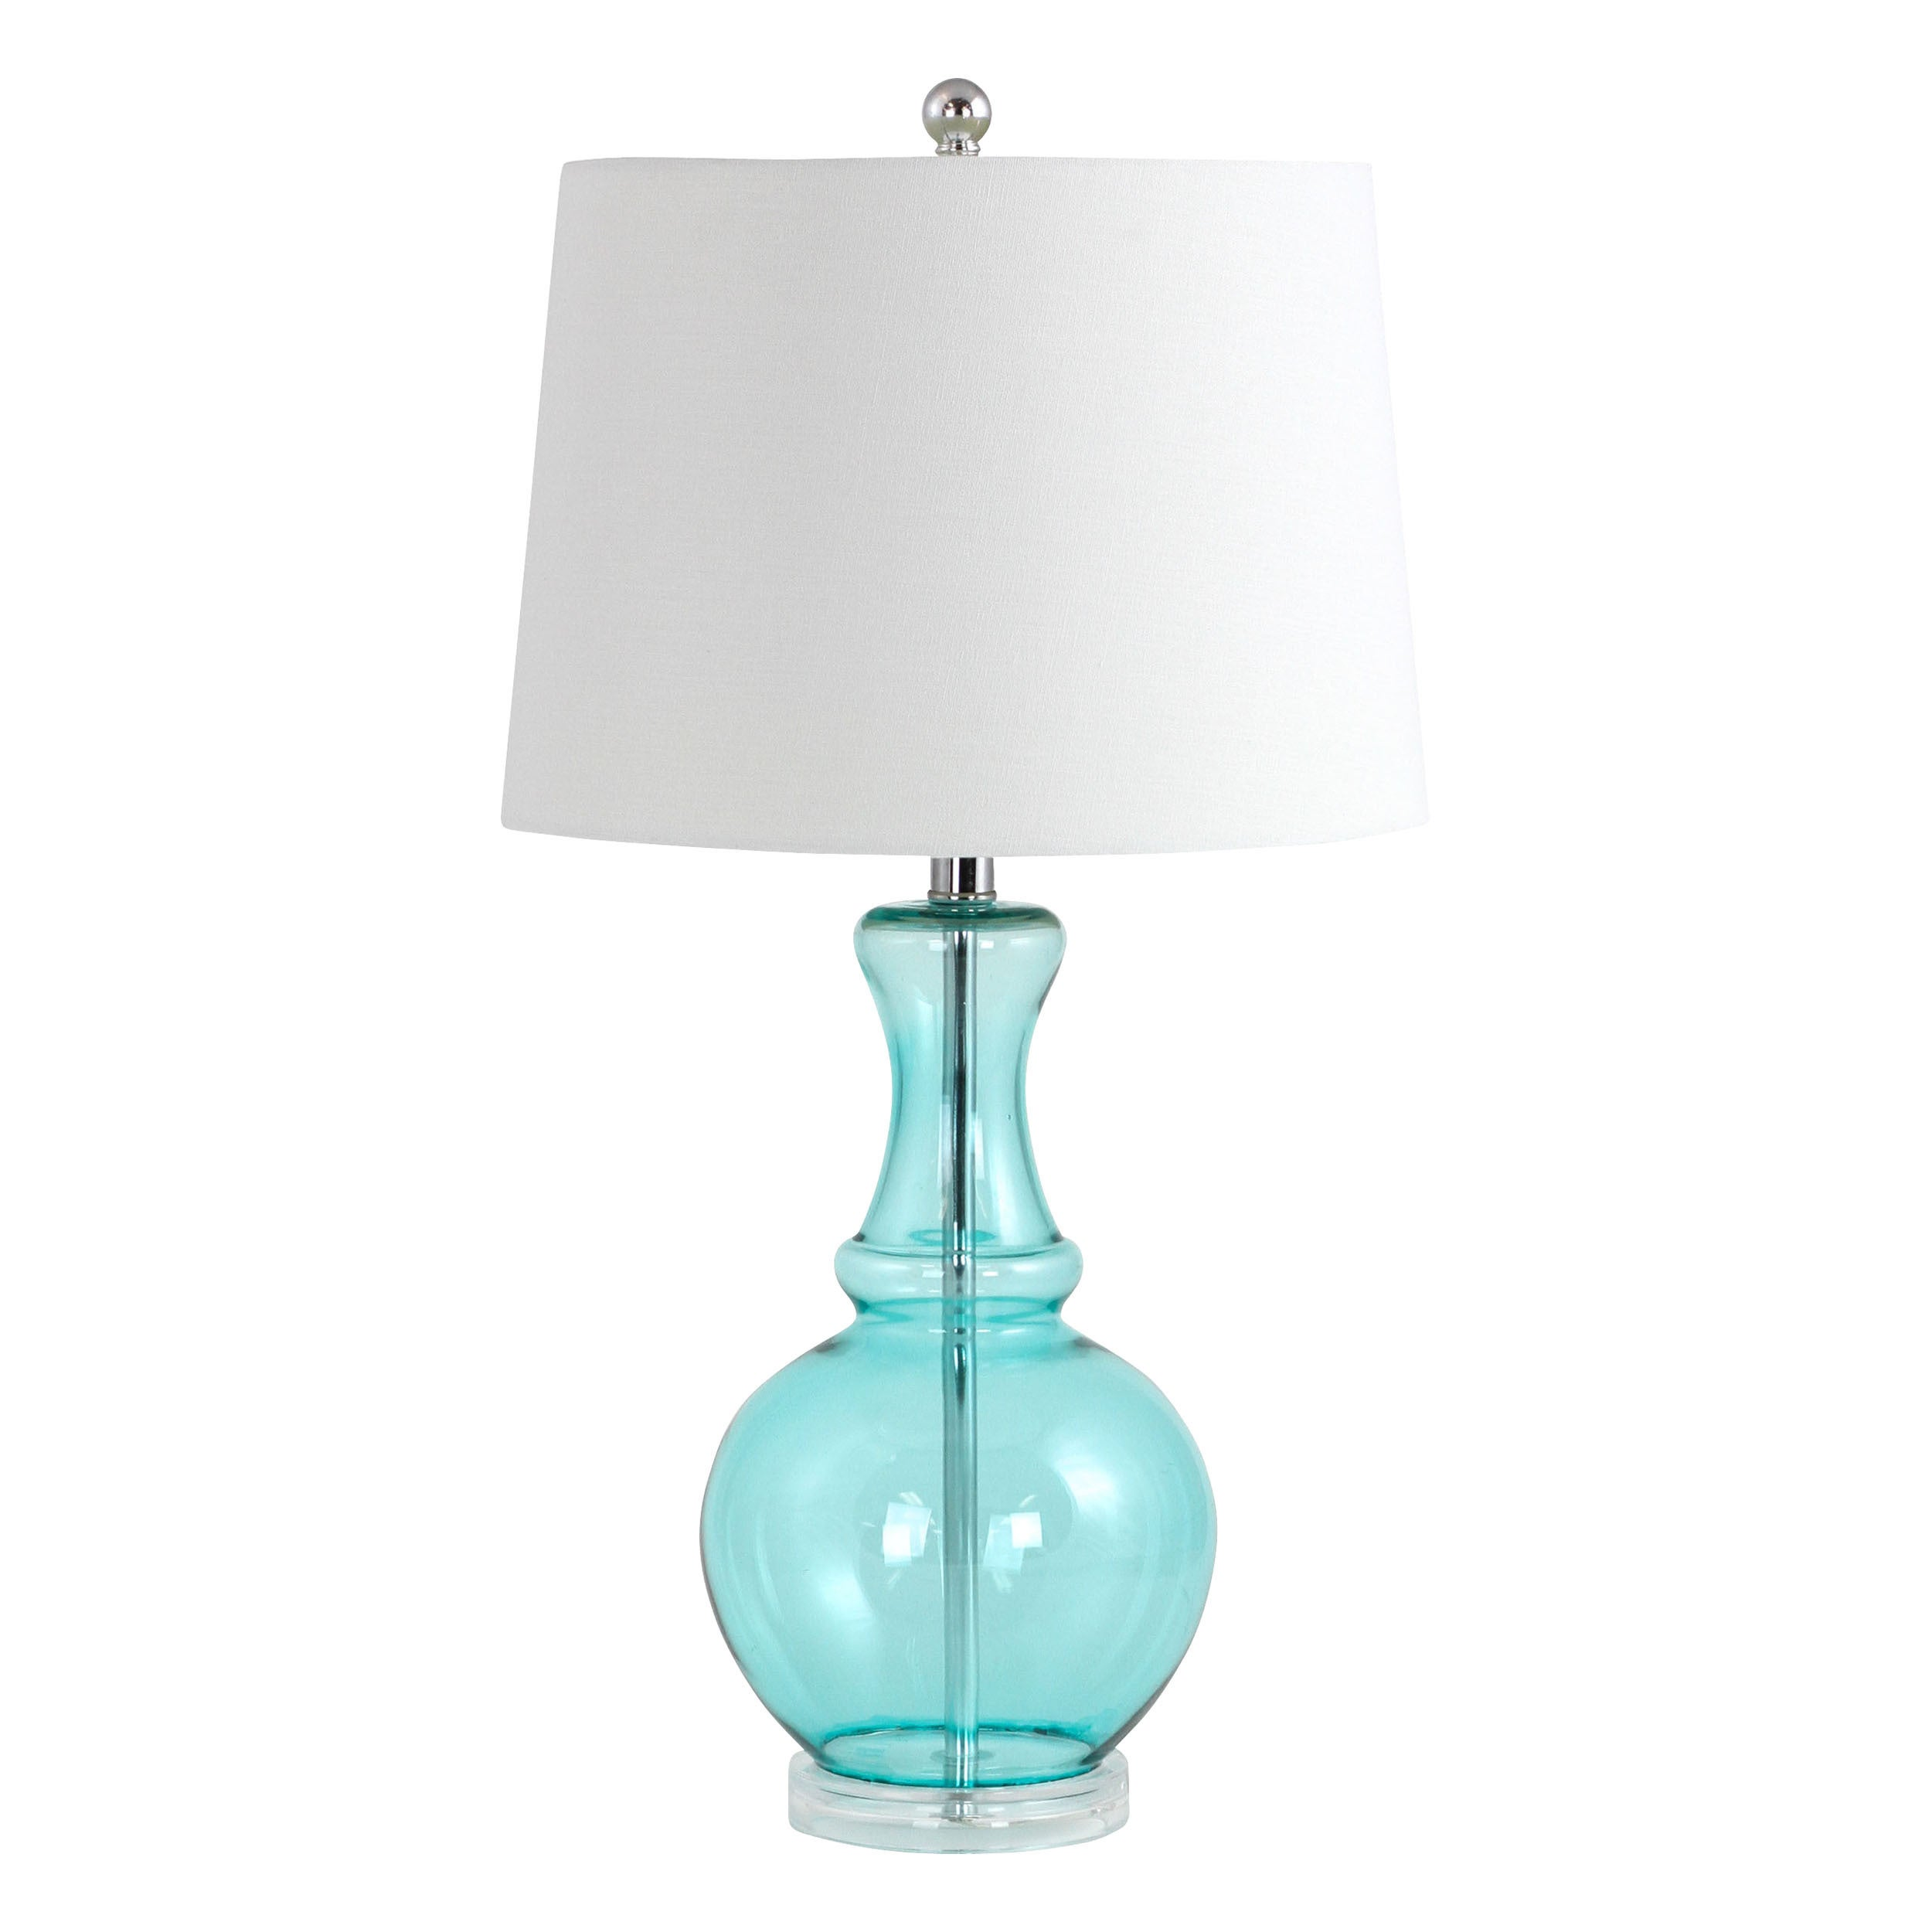 ASPIRE Sabine Teal Glass Table Lamp, Blue